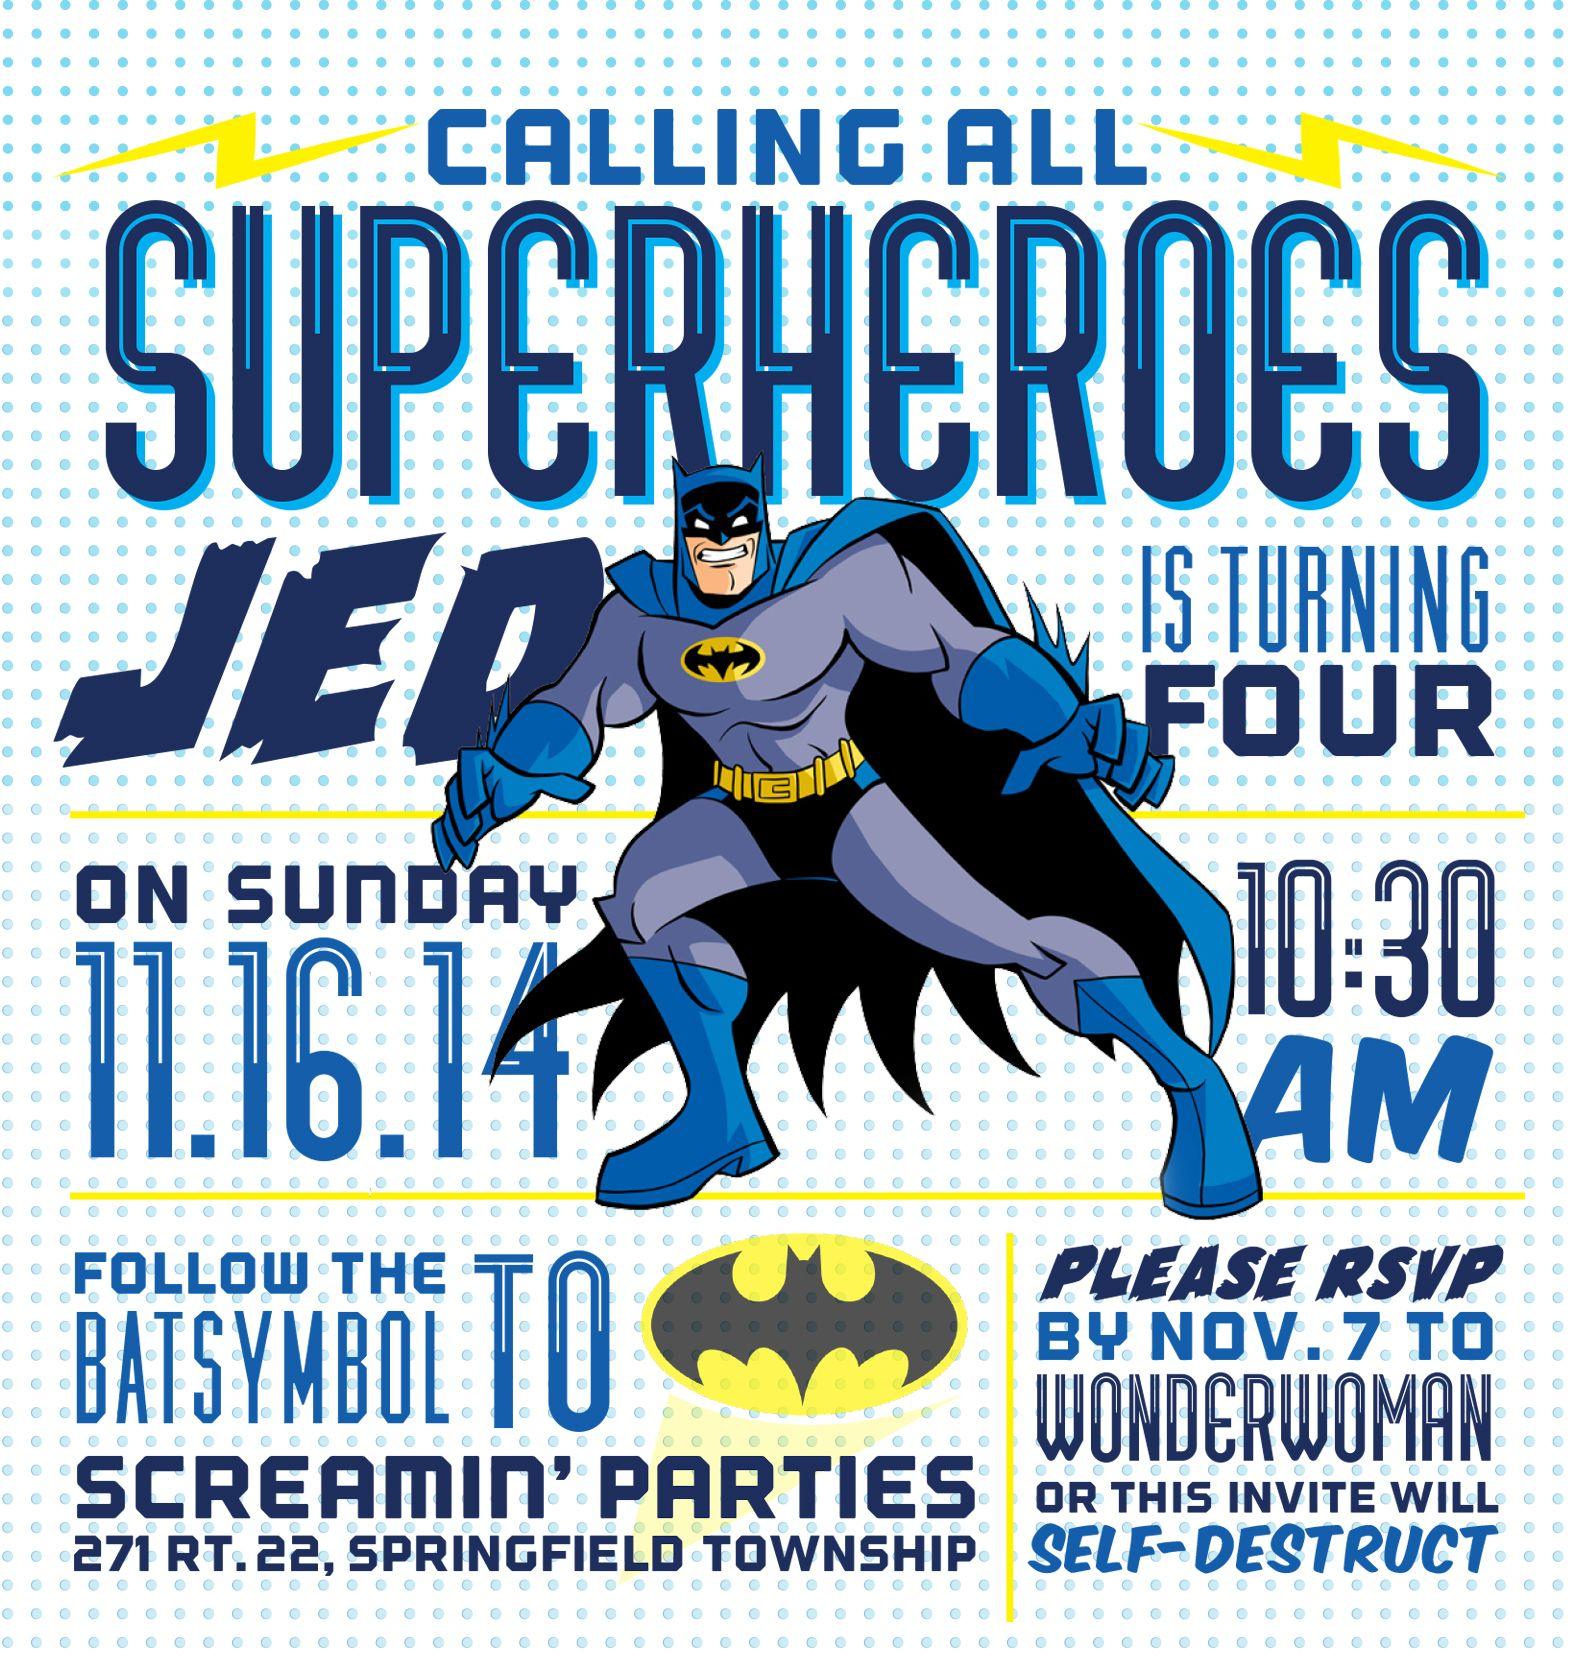 Superhero birthday party invitation by ilysiadesign.com ...